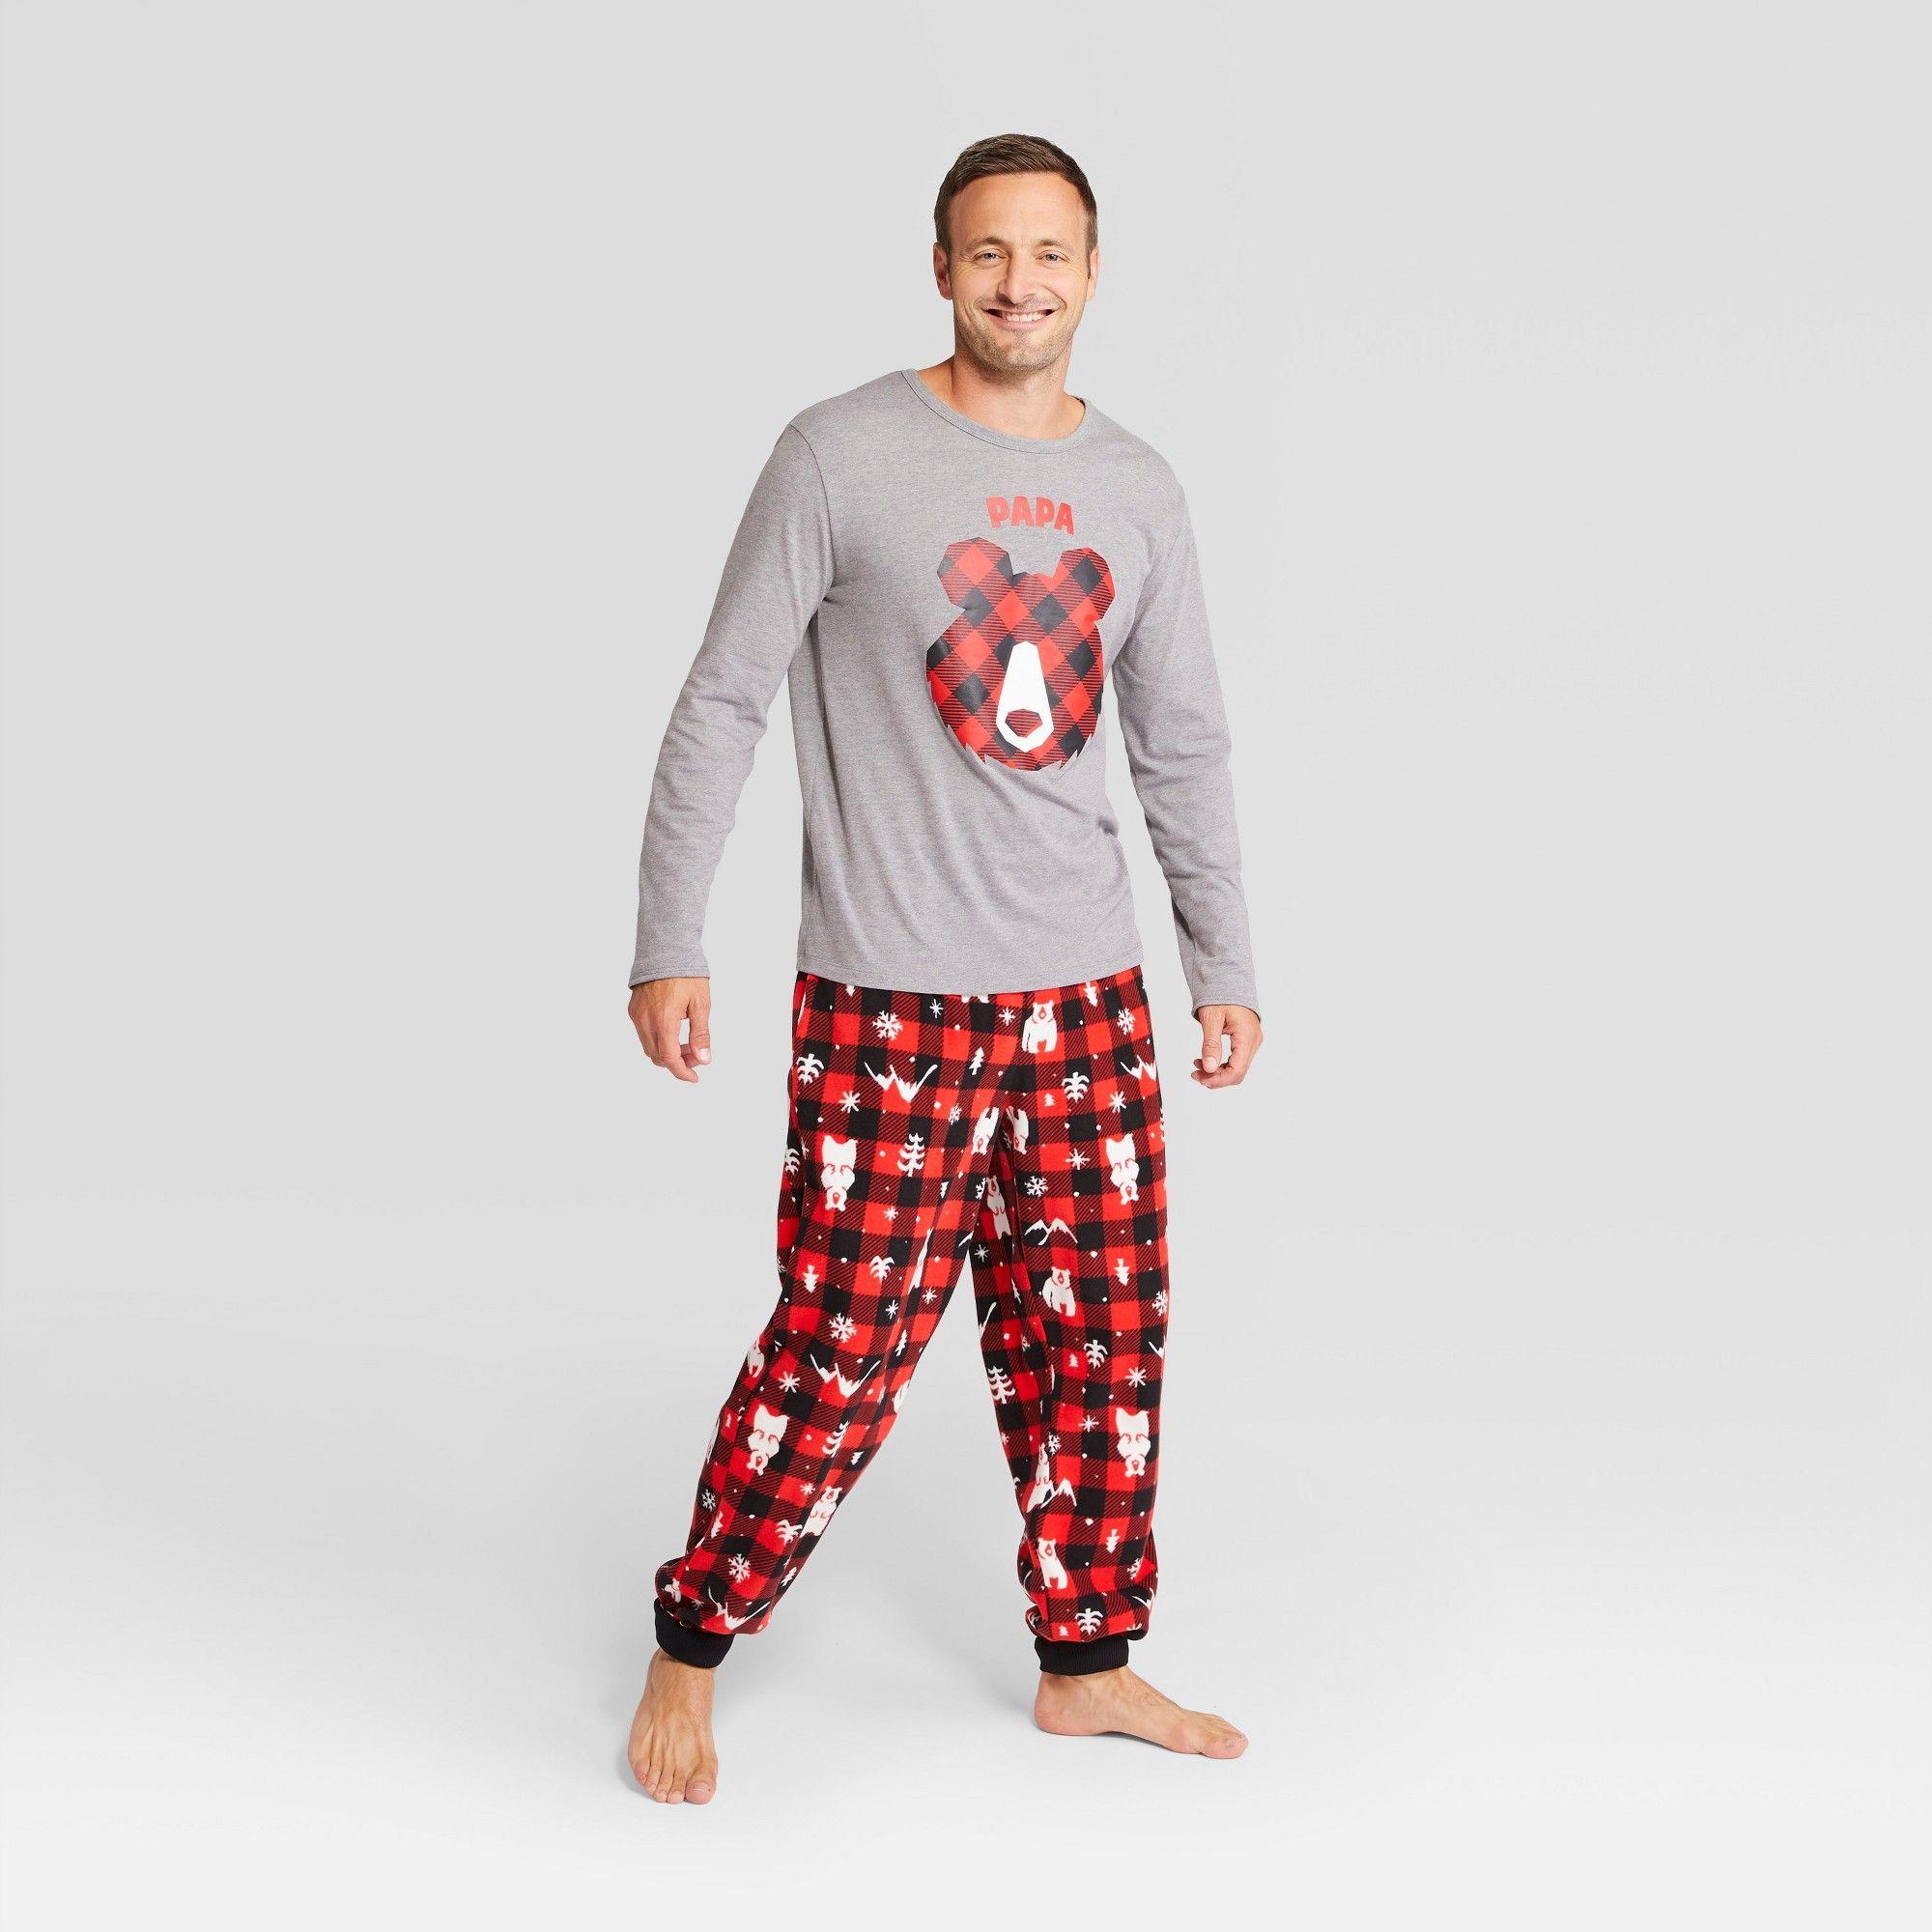 8a0c7eb542 Men s Holiday Bear Pajama Set - Wondershop Red S